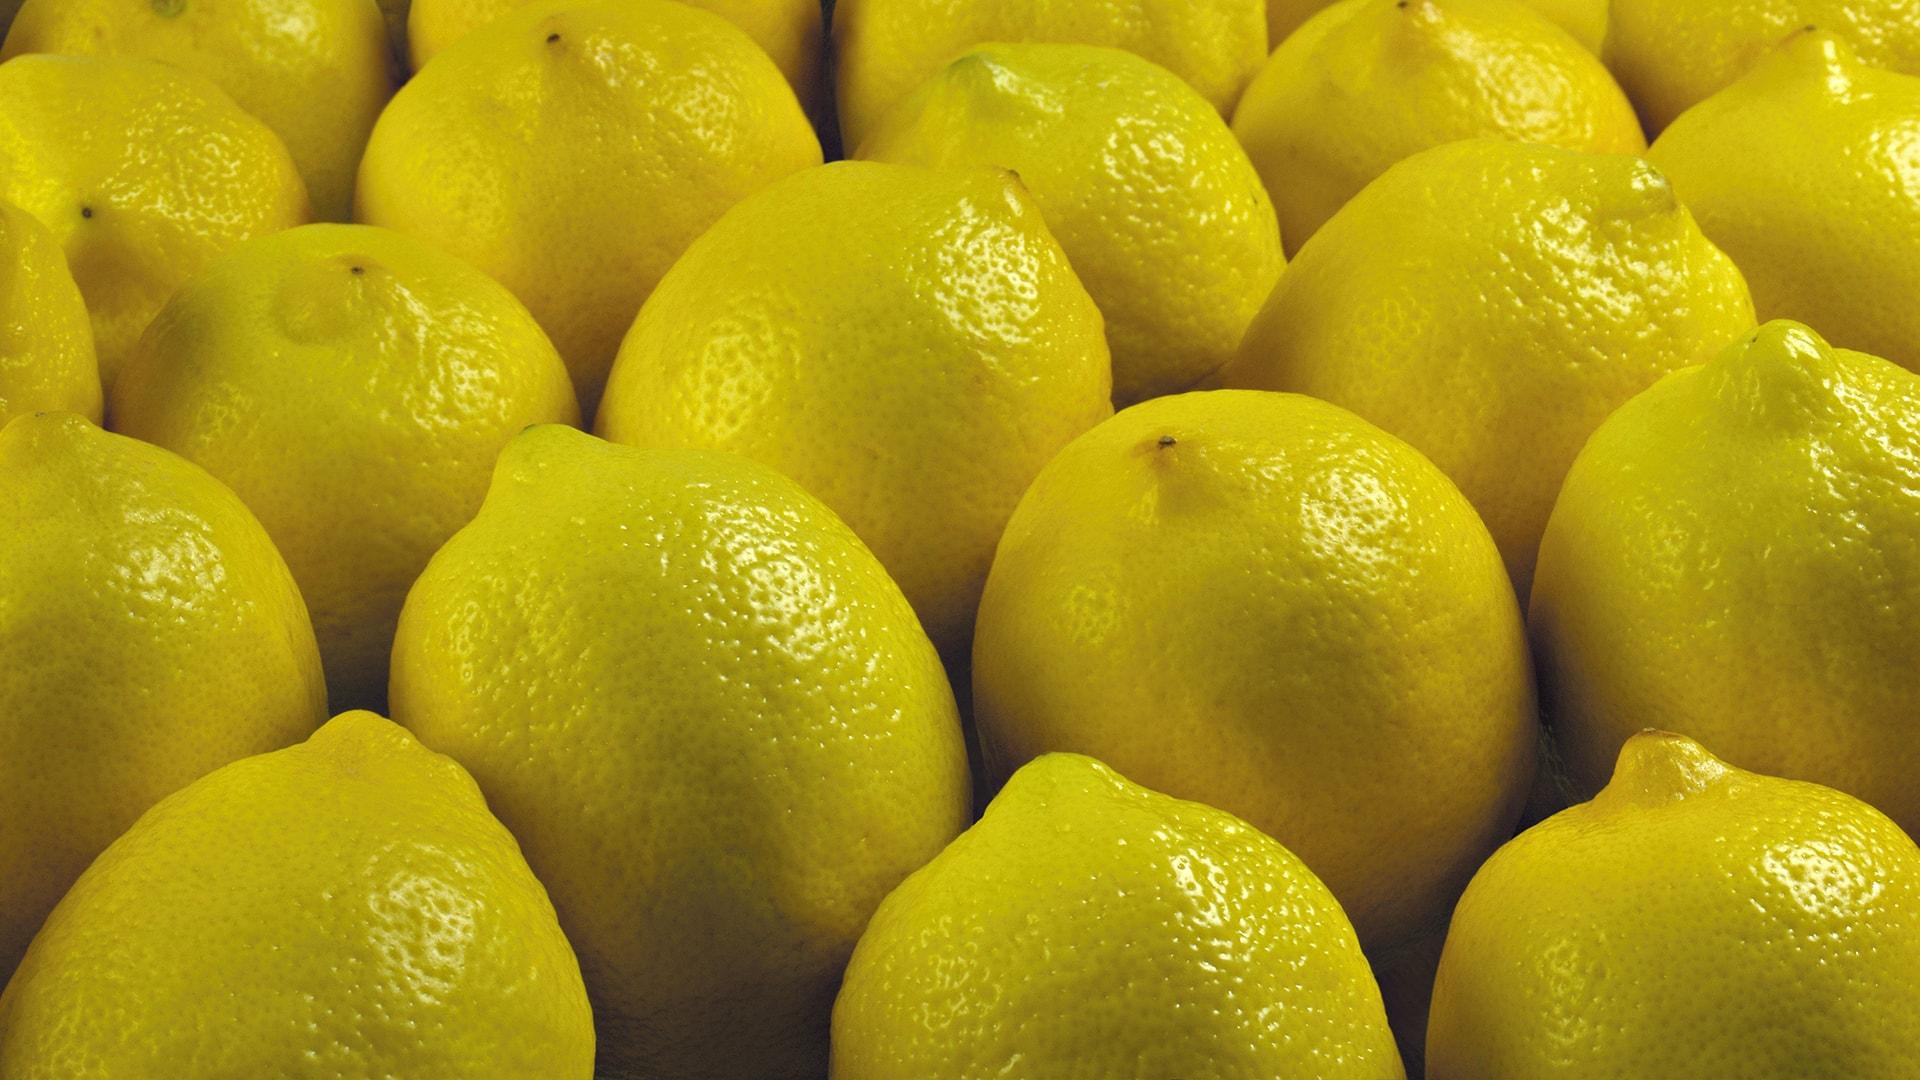 Lemon free